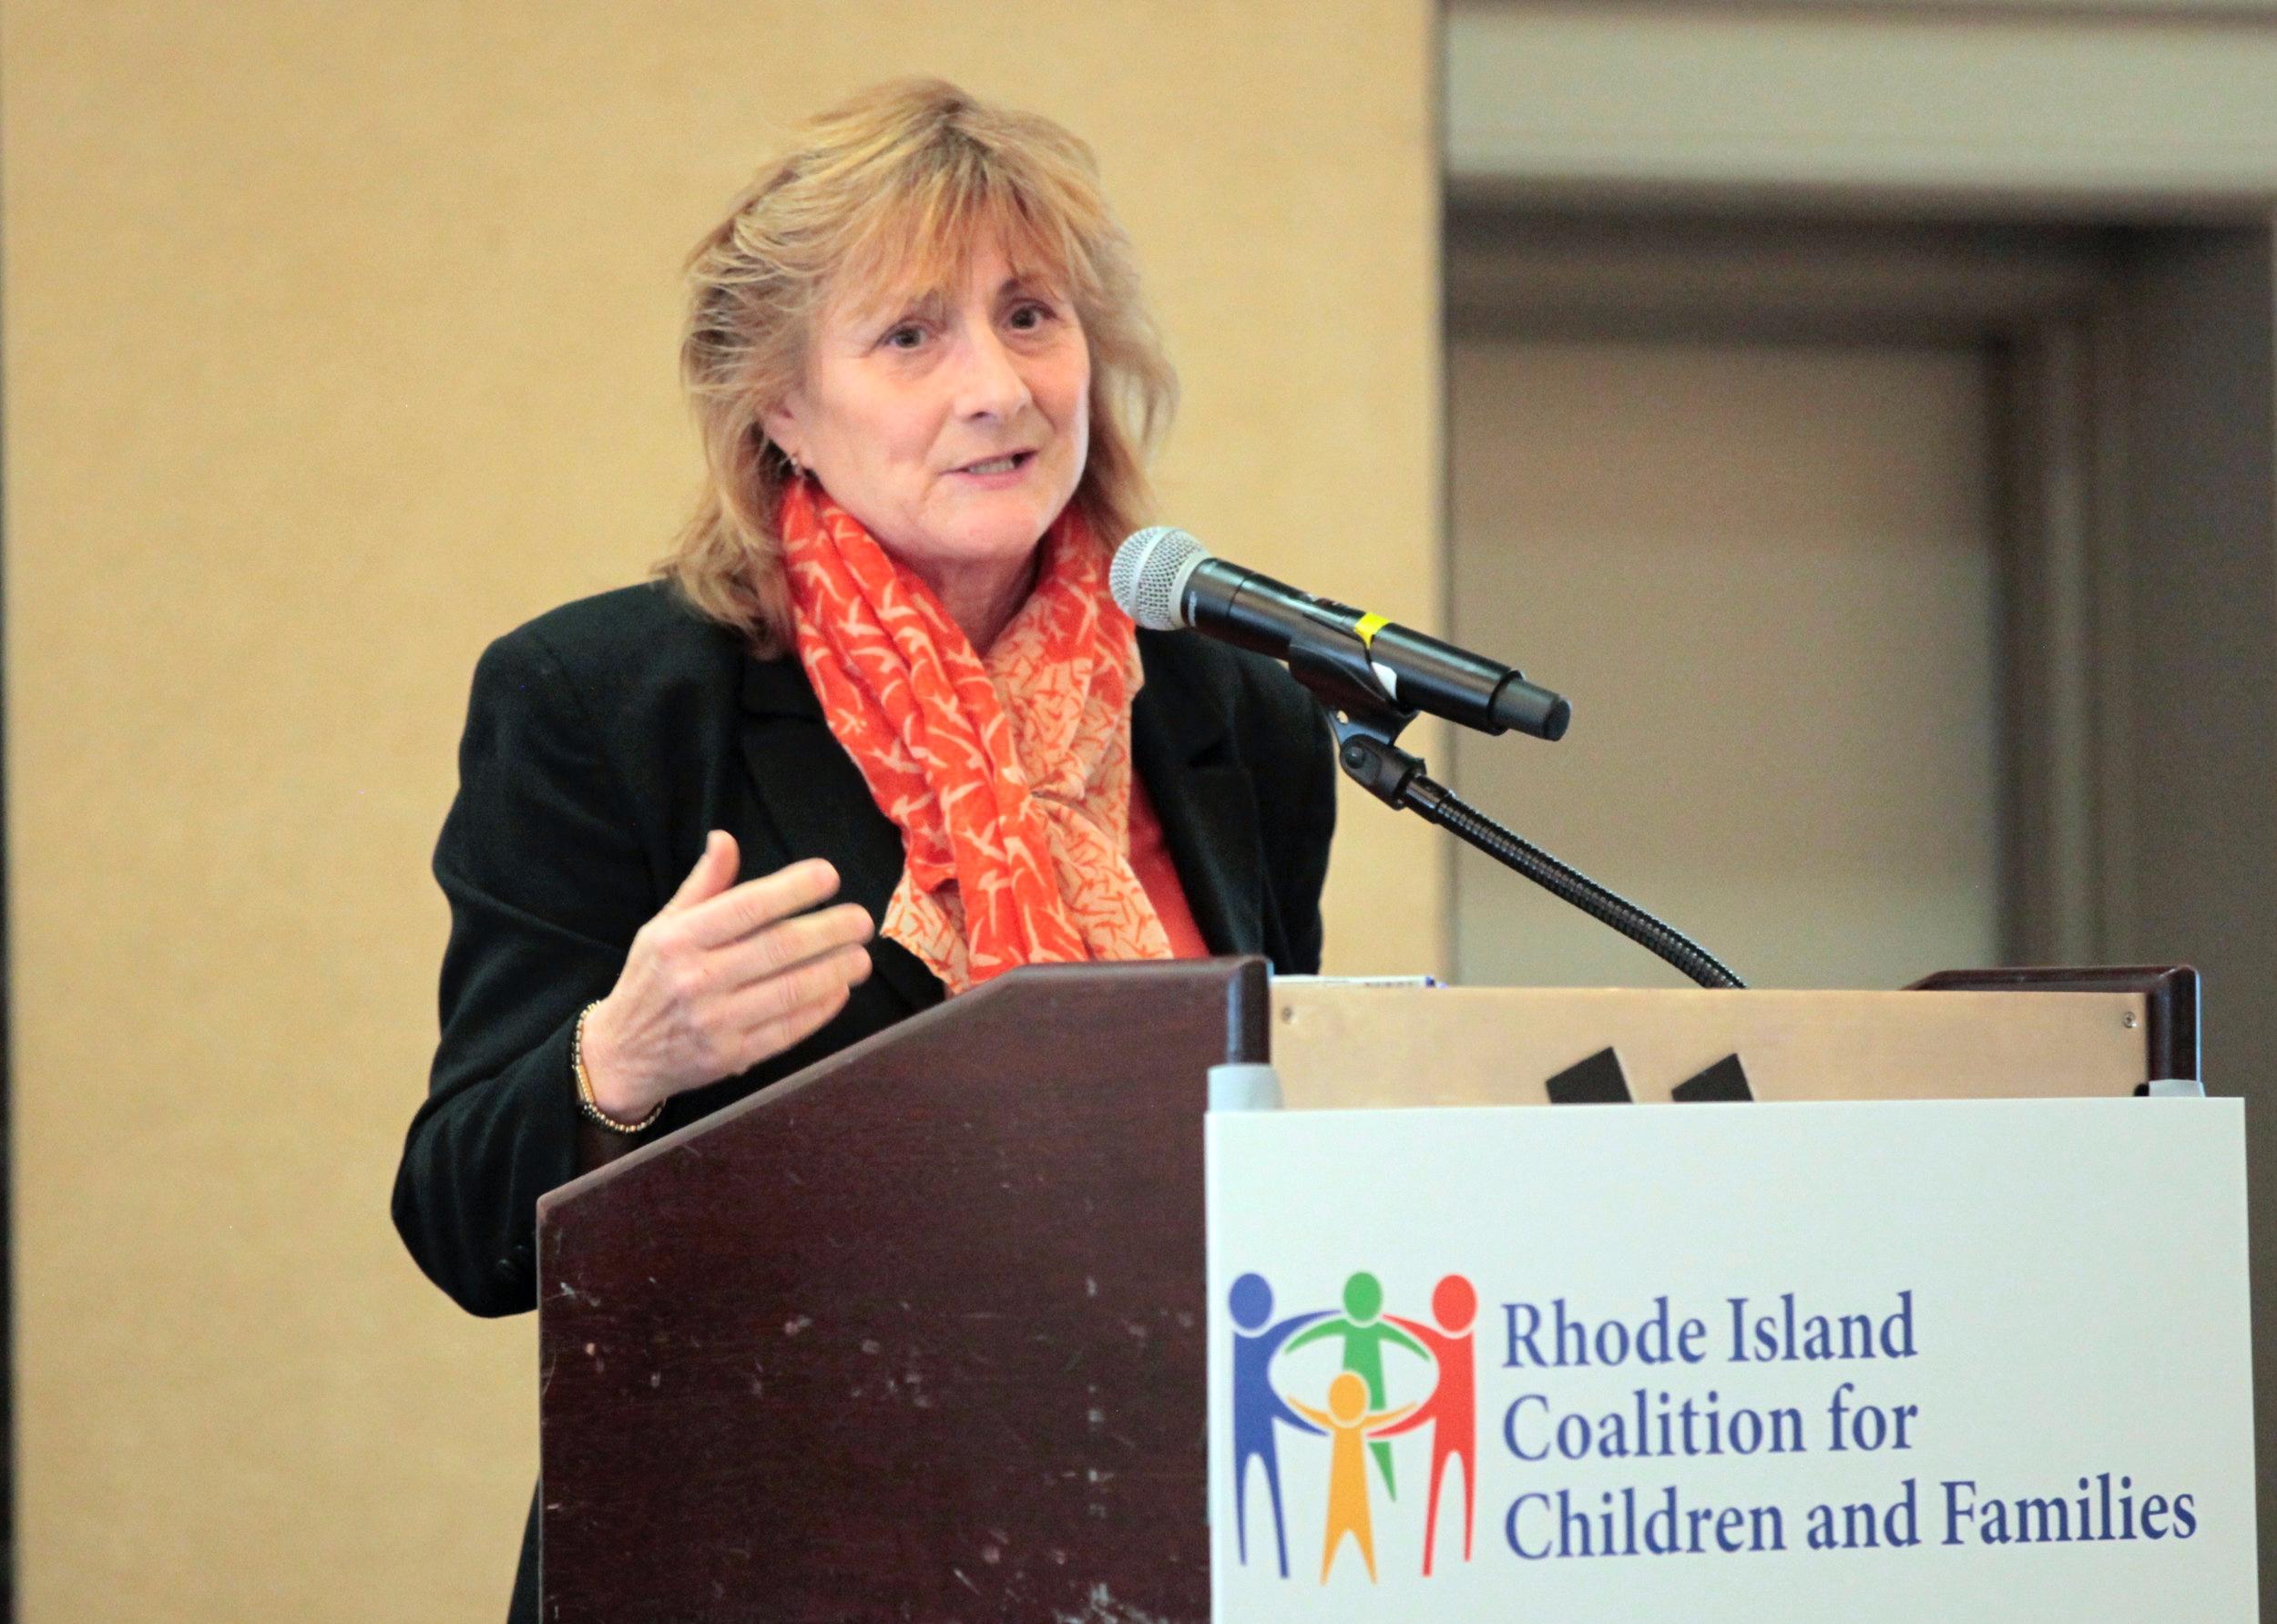 Representative Deborah L. Ruggiero  receiving Legislative Champion award for passage of Voluntary Extension of Care.